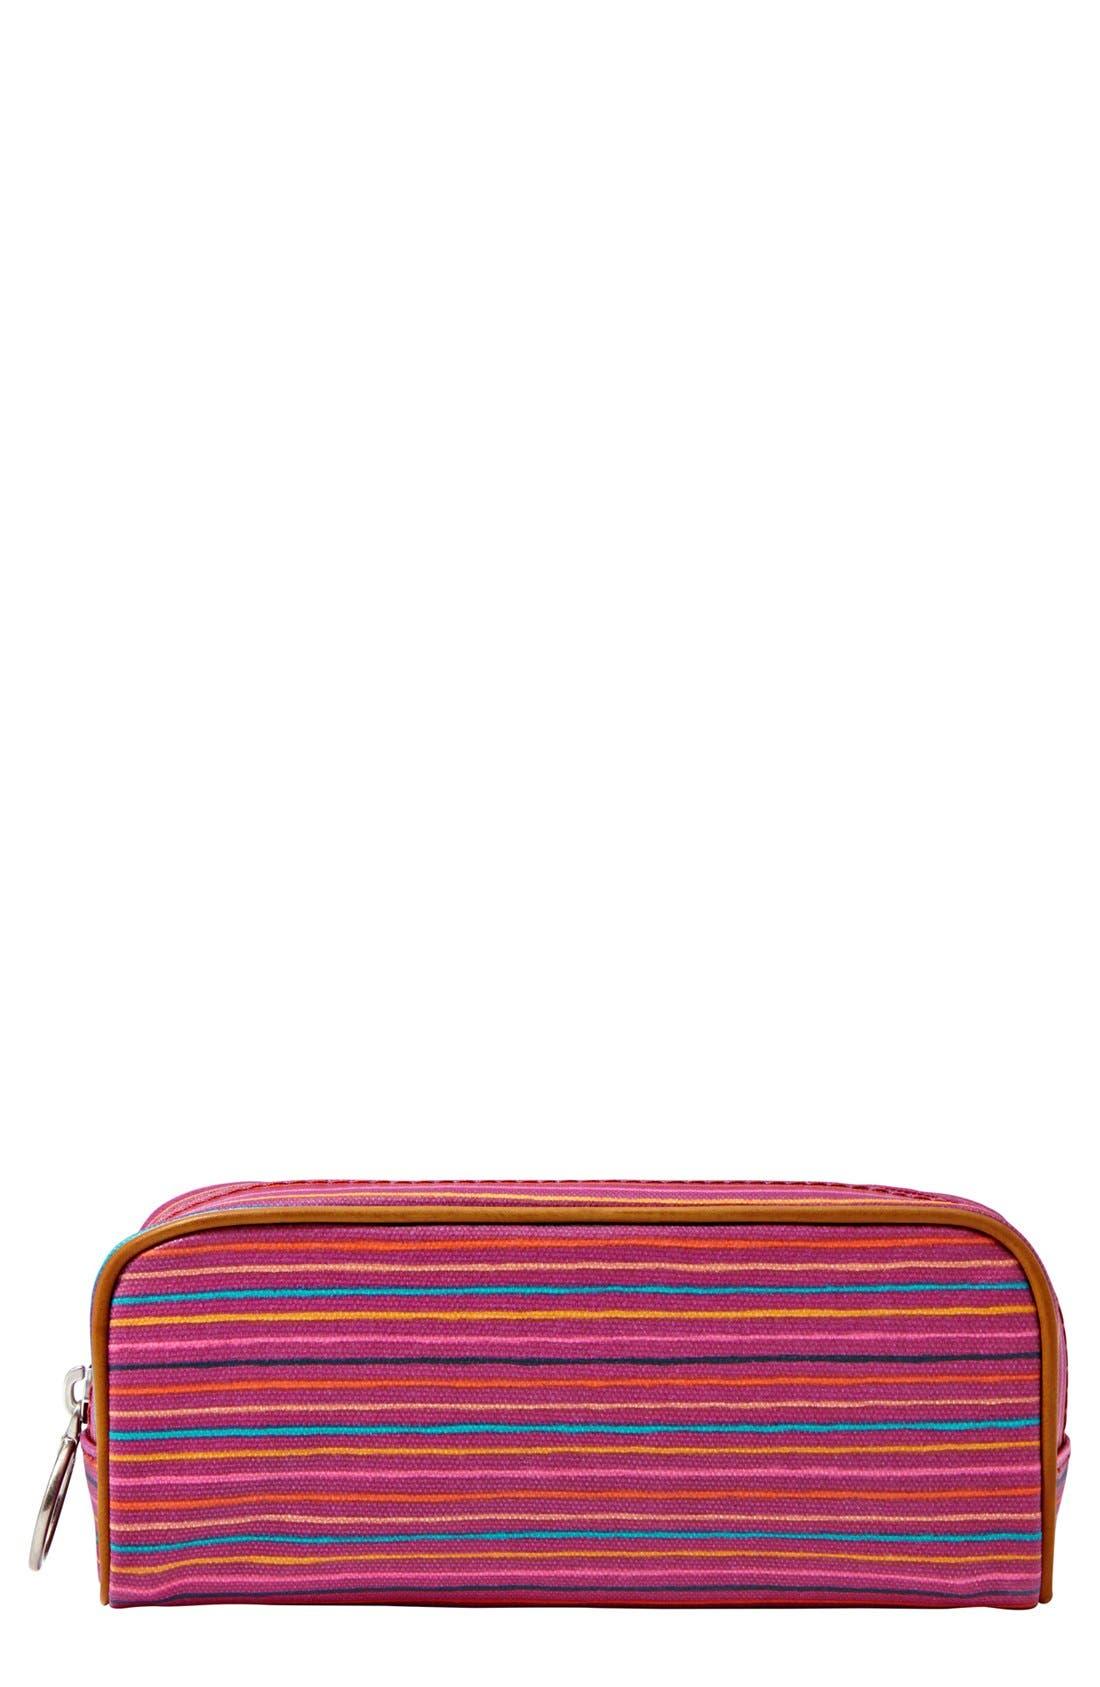 Main Image - Fossil 'Keyper' Cosmetics Bag